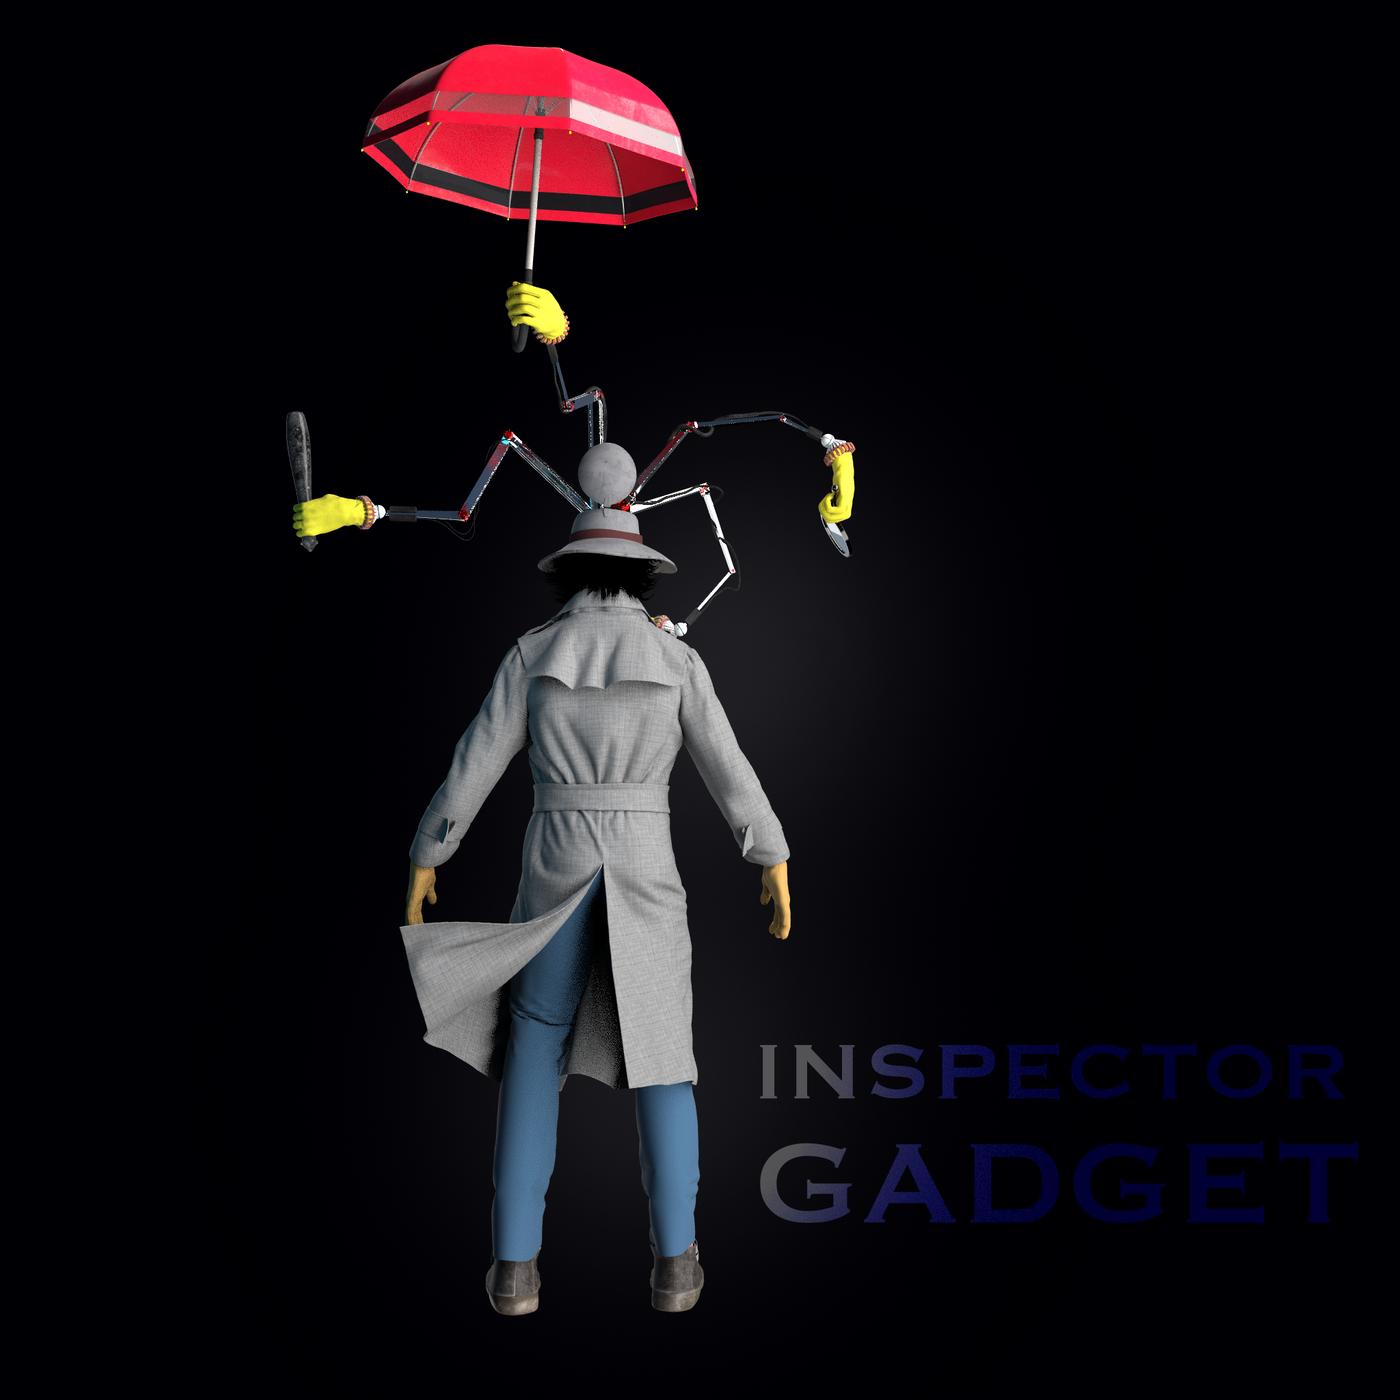 Inspector Gadget 3 Paulgkantinas